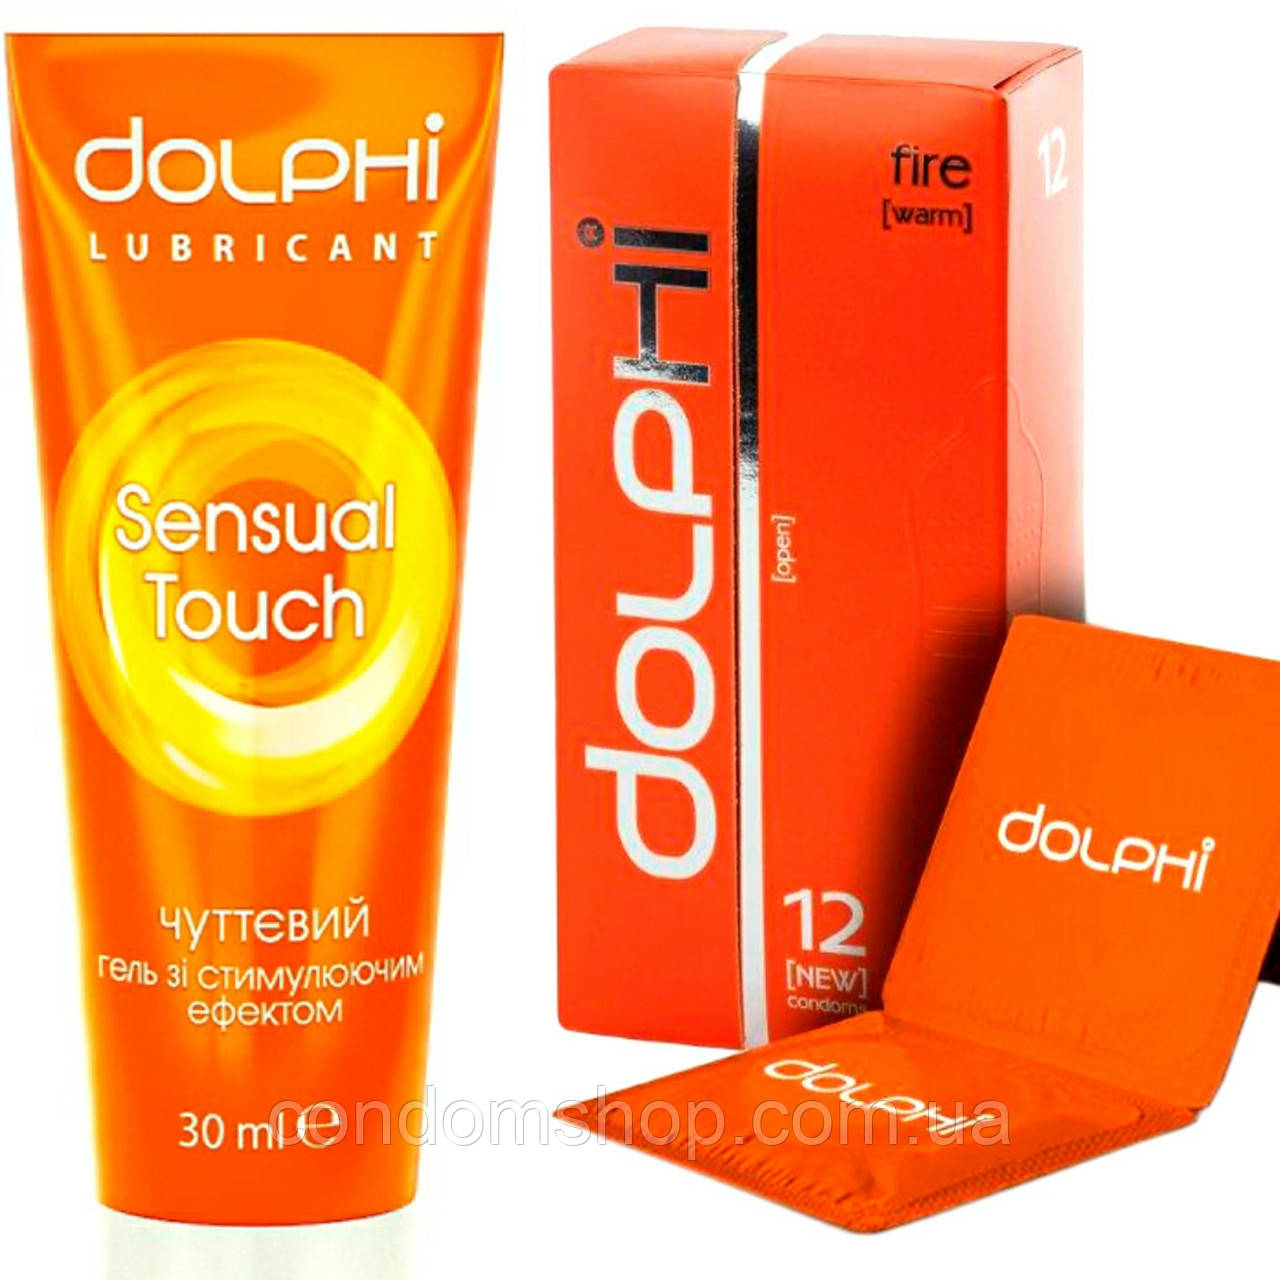 "Набір Dolphi lux ,,Полум'я пристрасті"":презервативи Dolphi Fire +гель-змазка Sensual Touch"